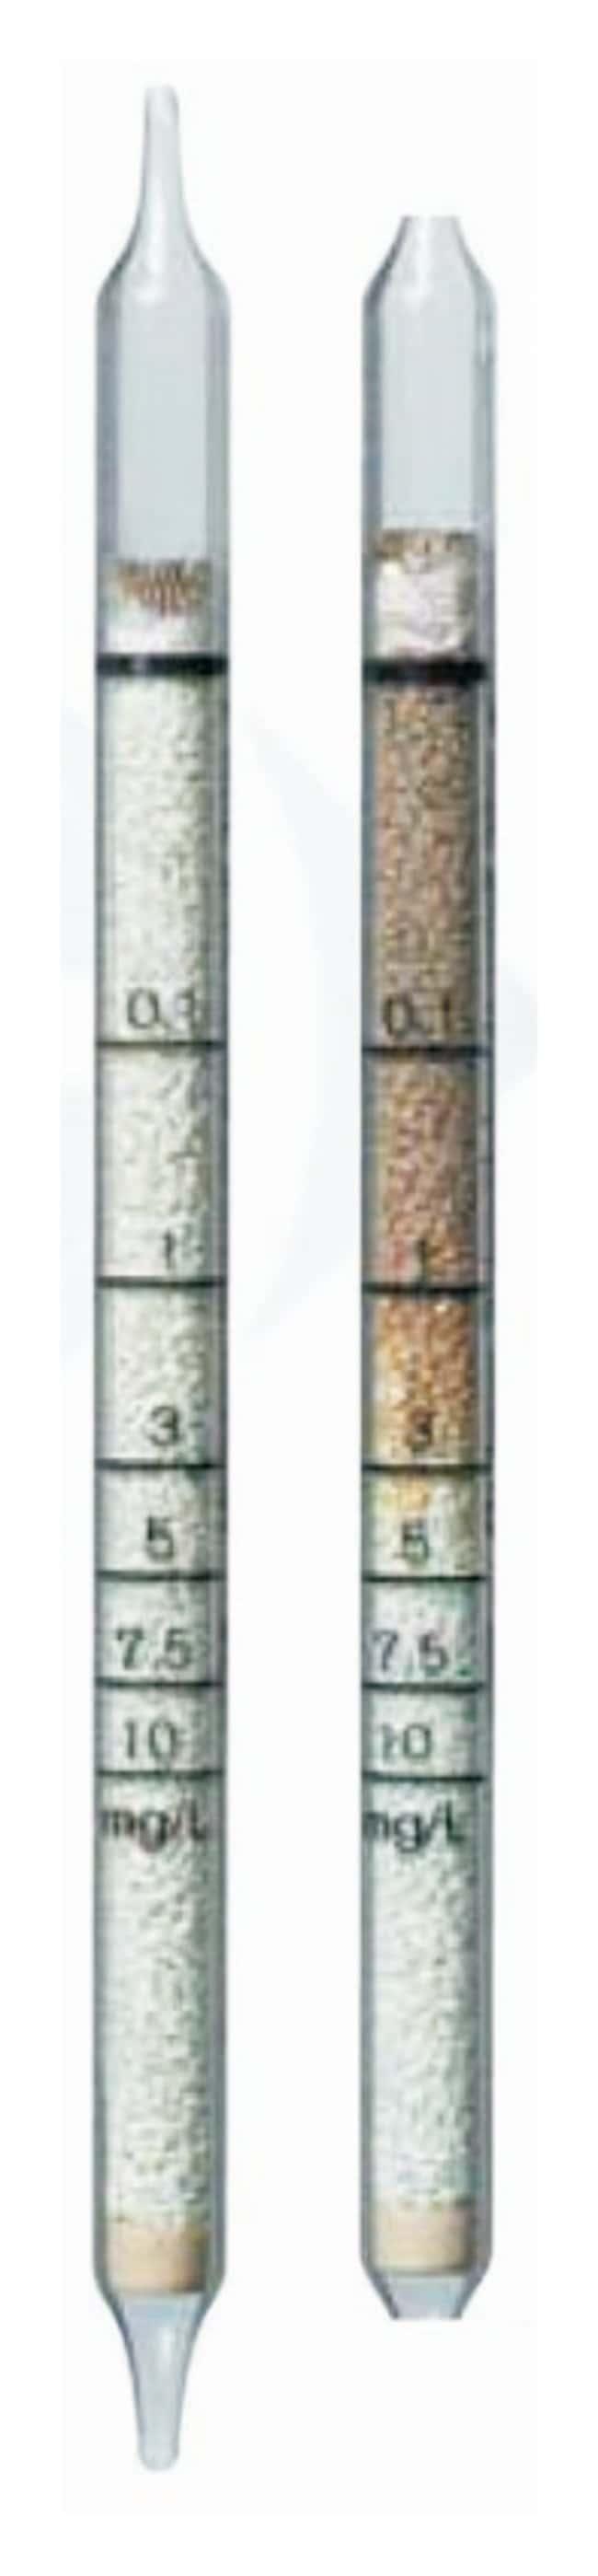 Dräger™Short-Term Detector Tubes: Carbon Disulfide Carbon disulfide 30/a; Measuring Range: 32-3200ppm Dräger™Short-Term Detector Tubes: Carbon Disulfide